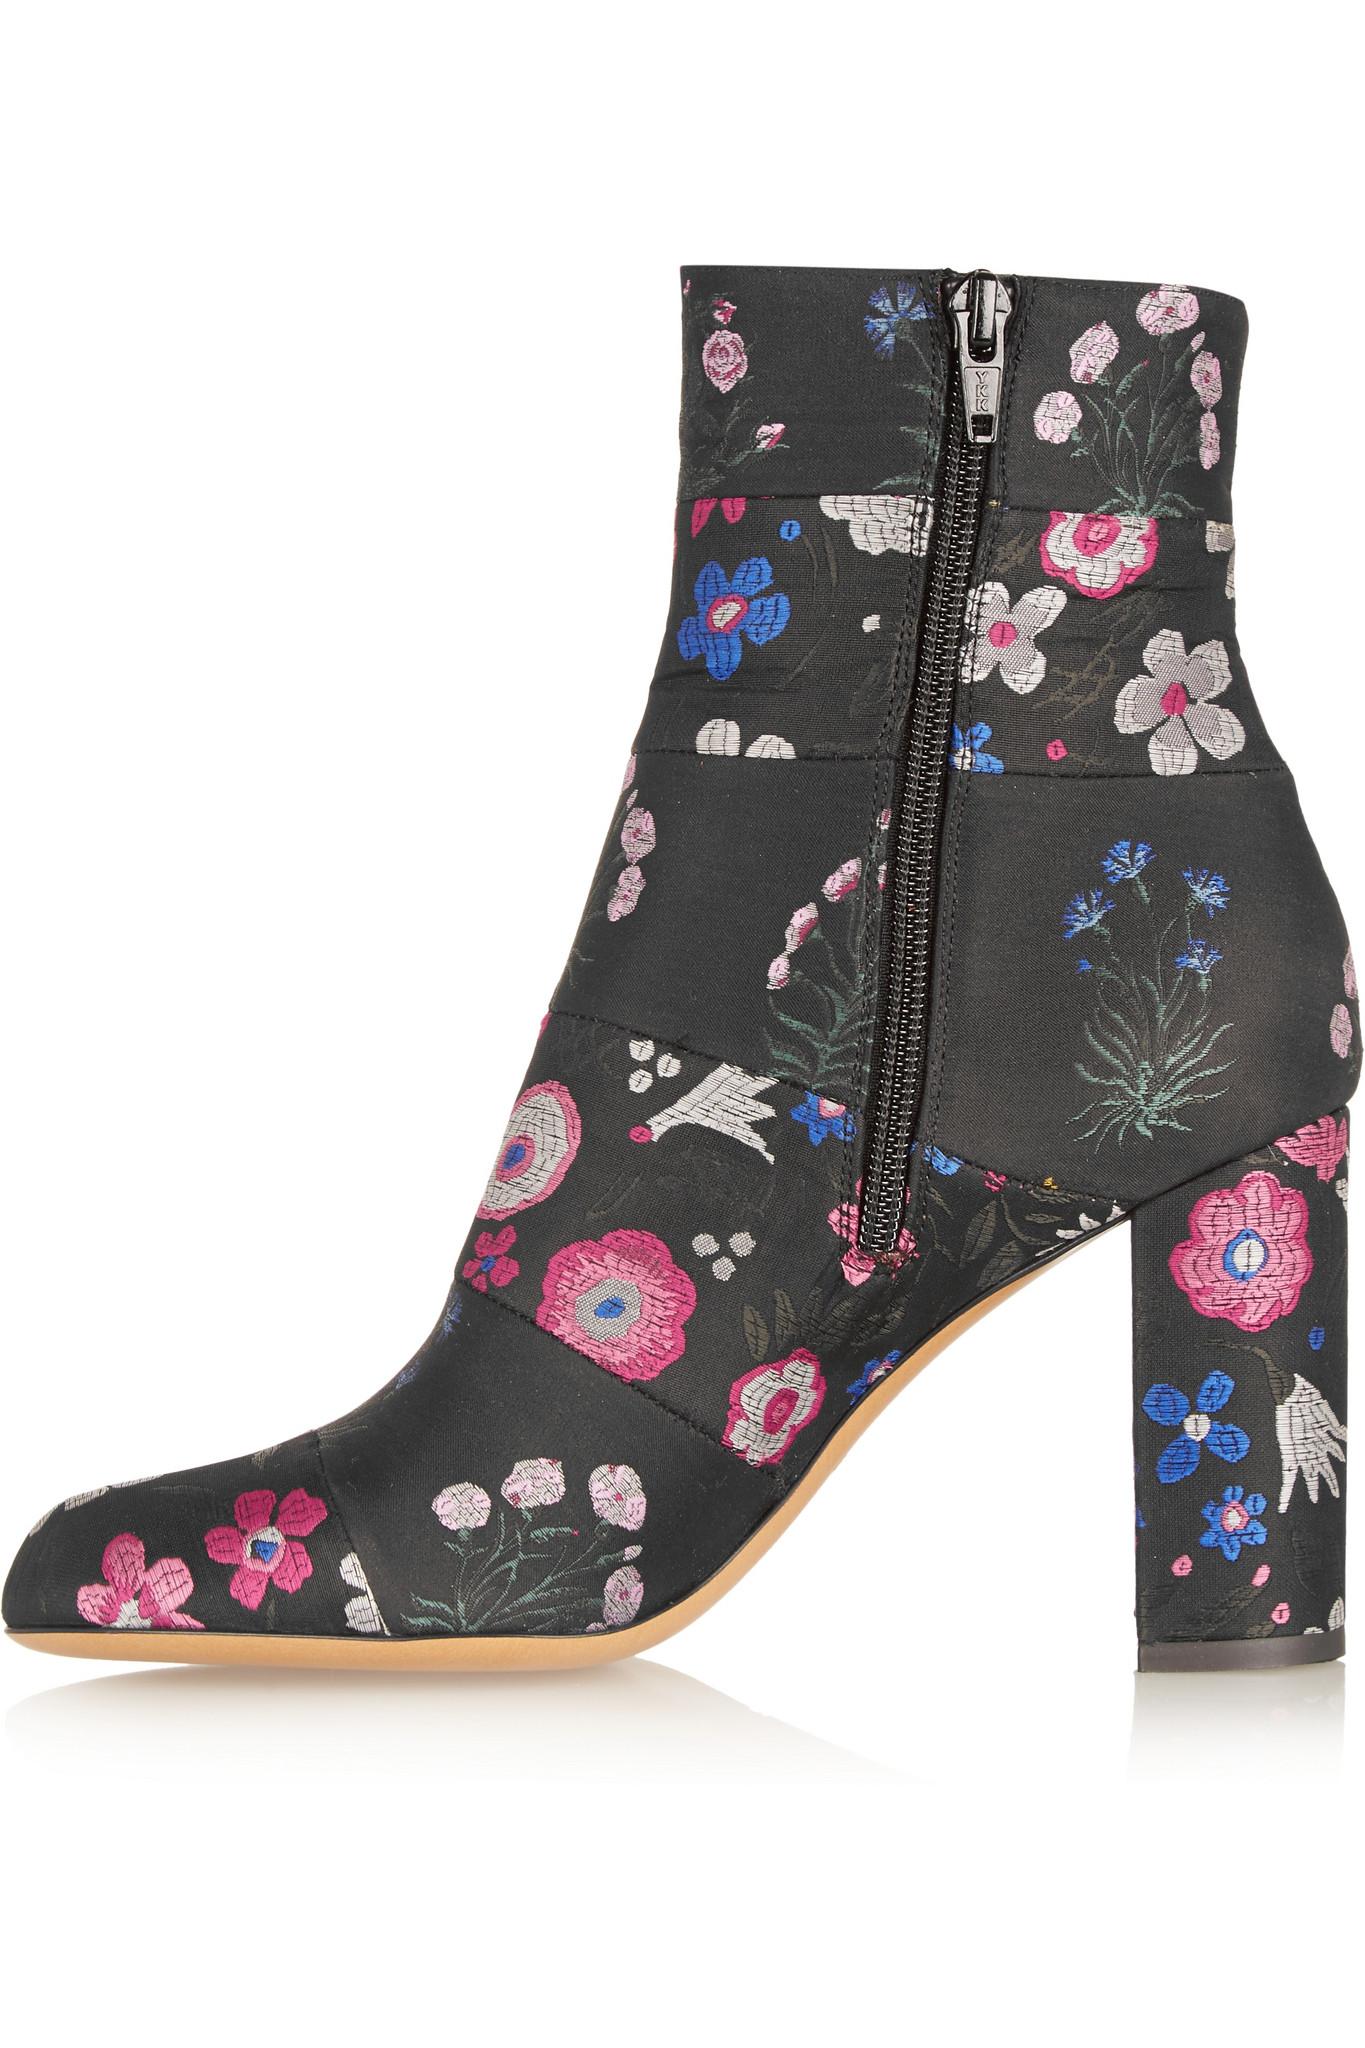 edb57277c85 Valentino Spring Garden Brocade Ankle Boots in Black - Lyst